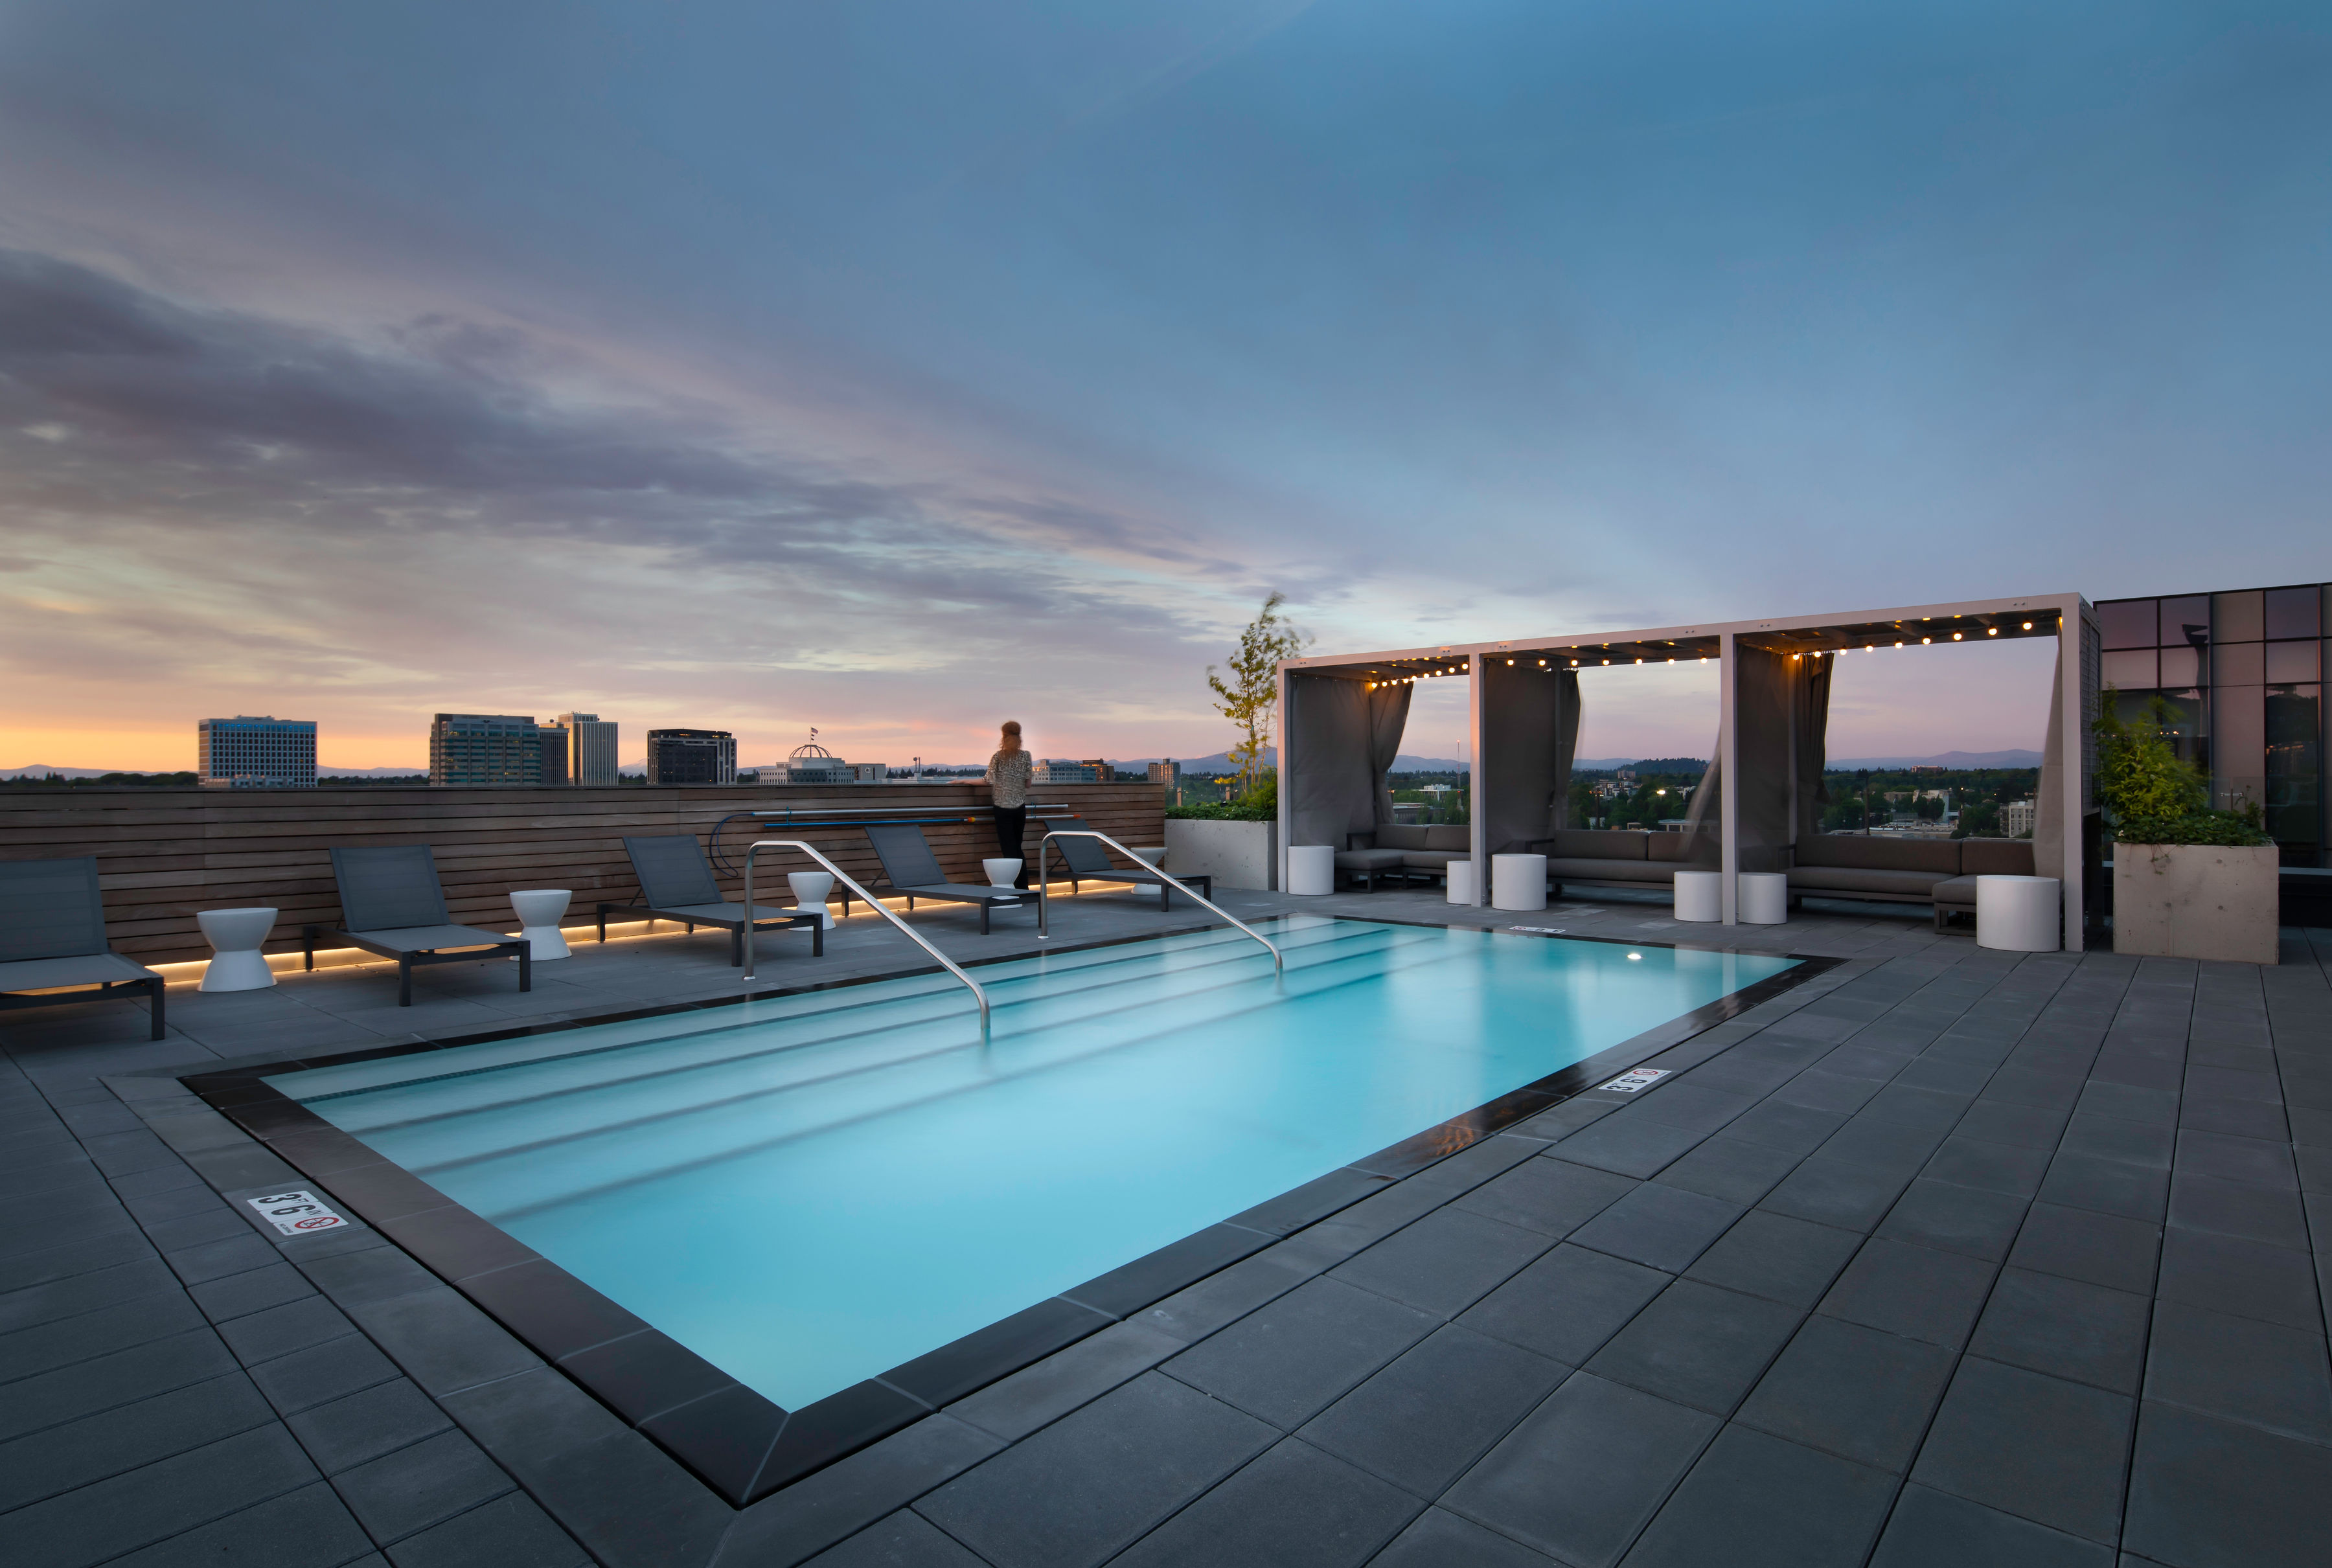 Pool Deck at Sunset at 5 MLK Apartments Portland, Oregon